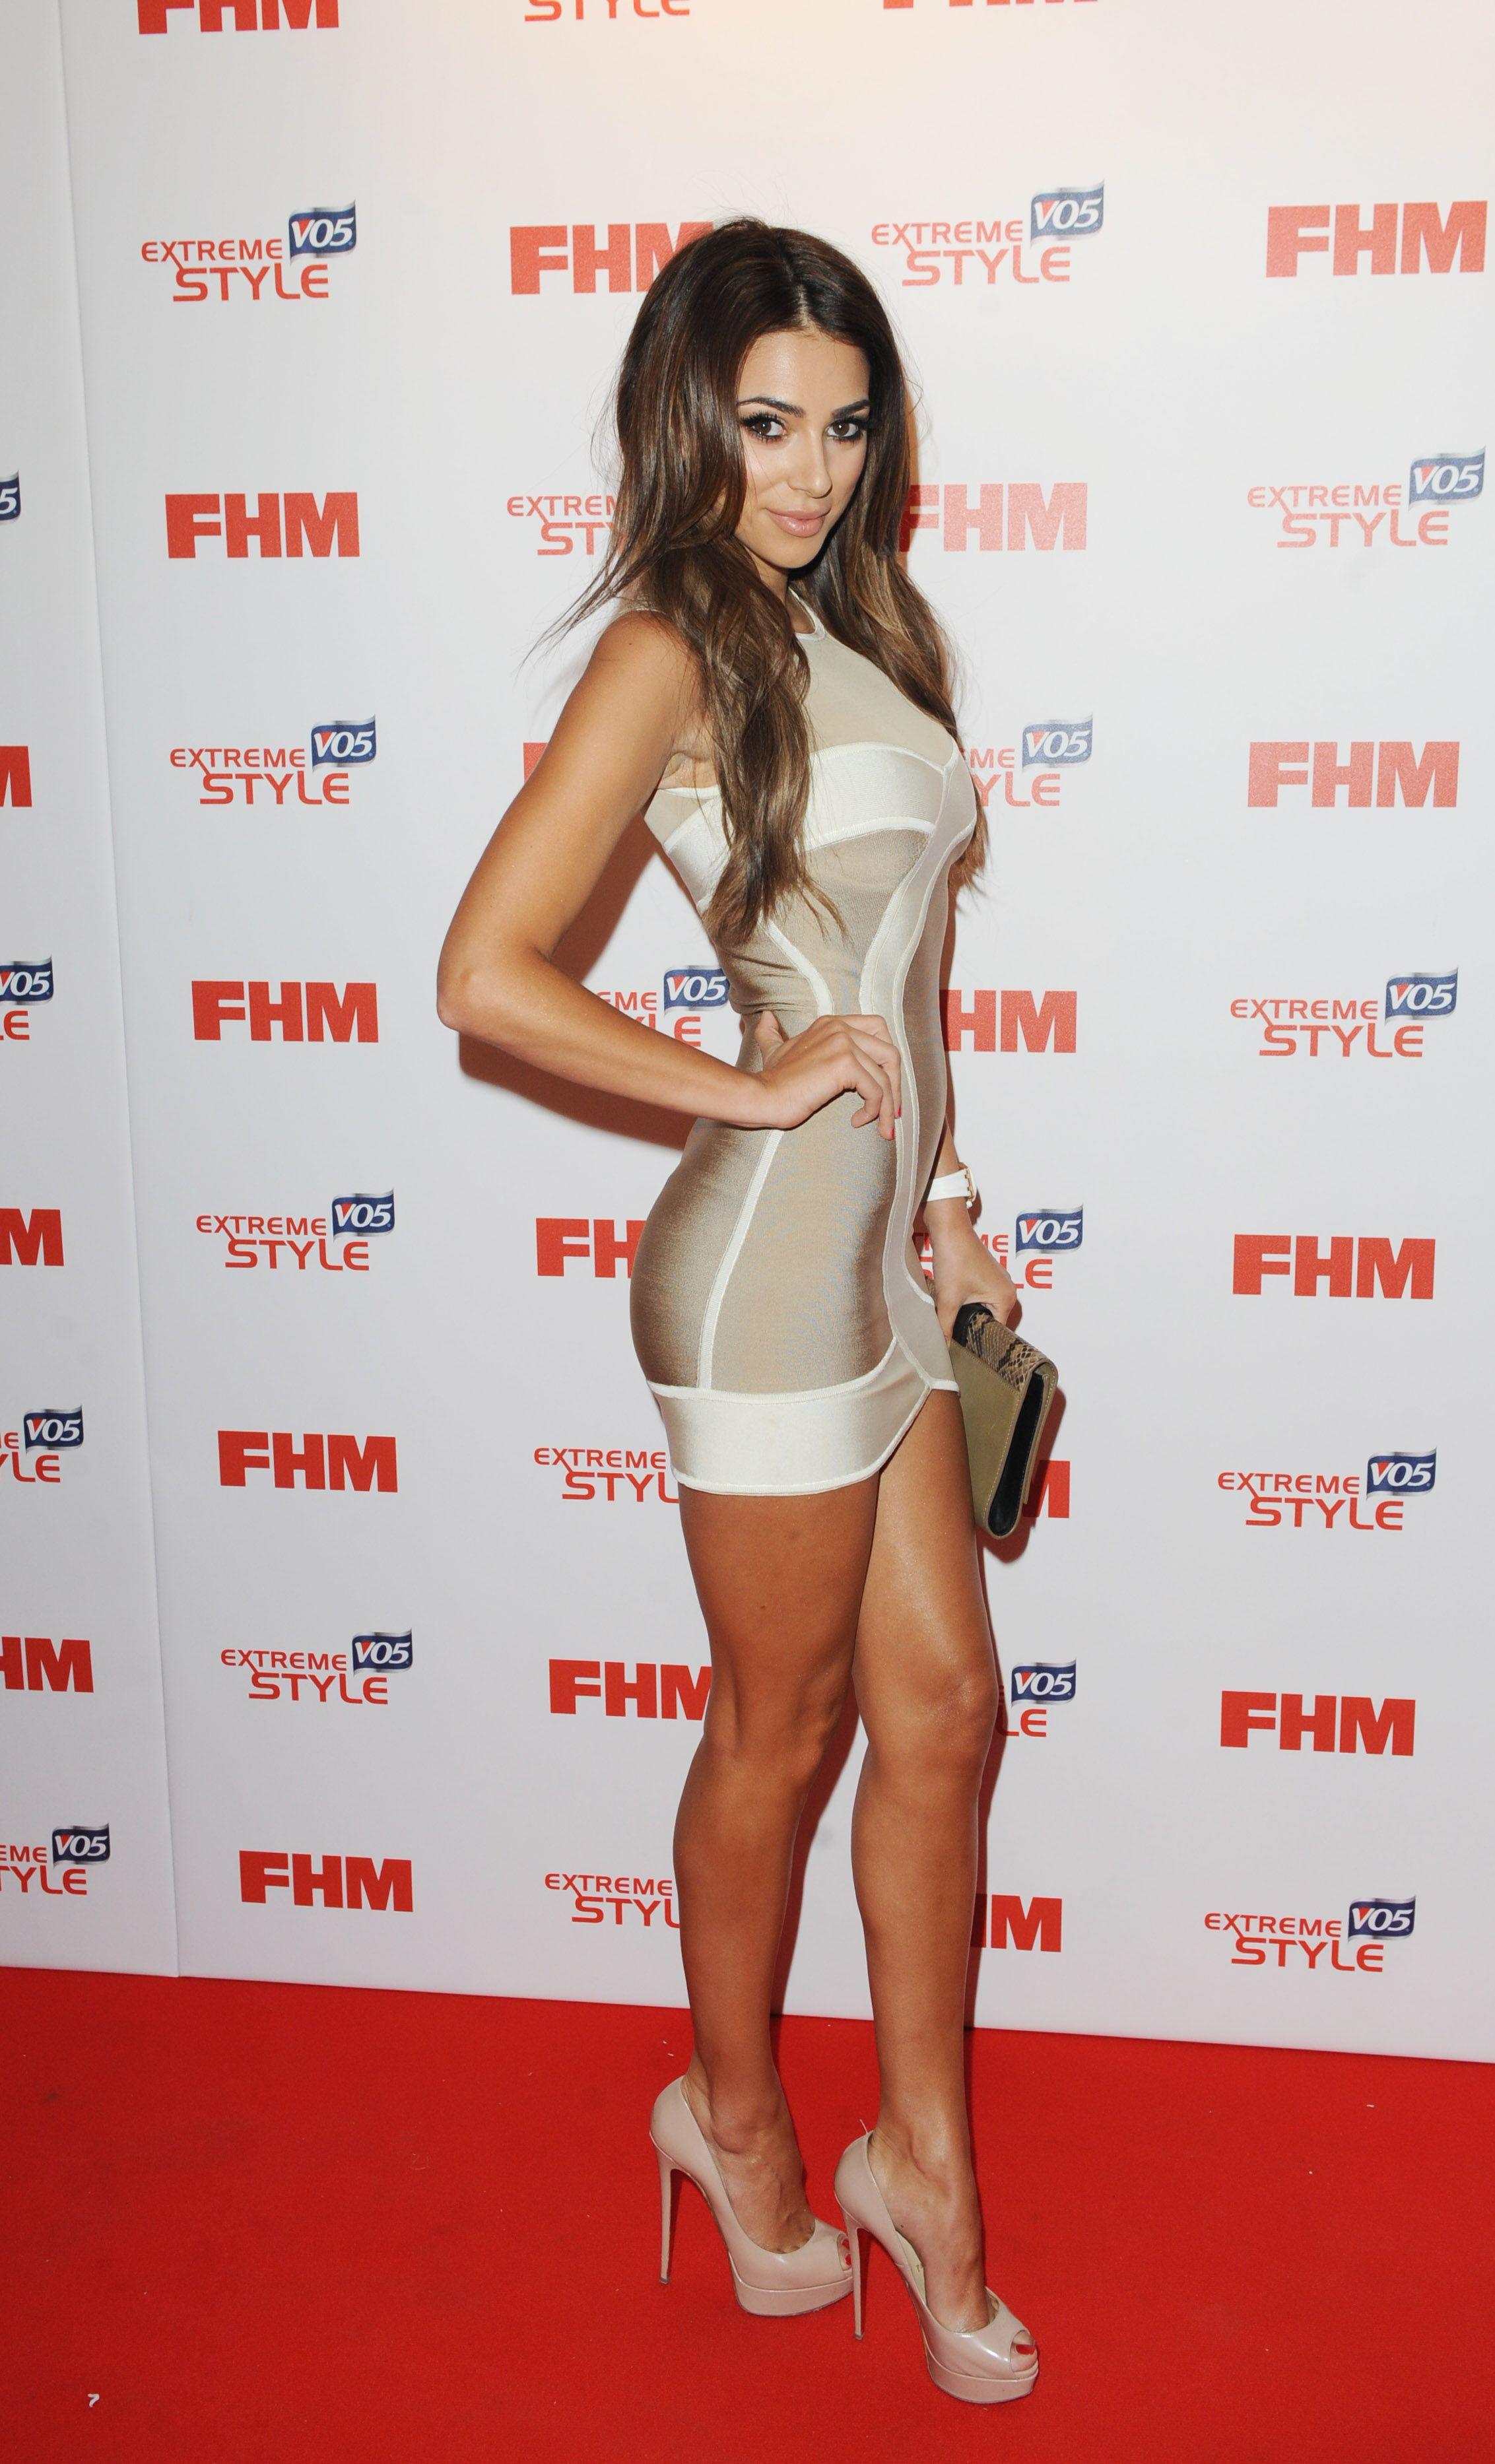 Georgia Salpa 2013 FHM 100 Sexiest Women In The World